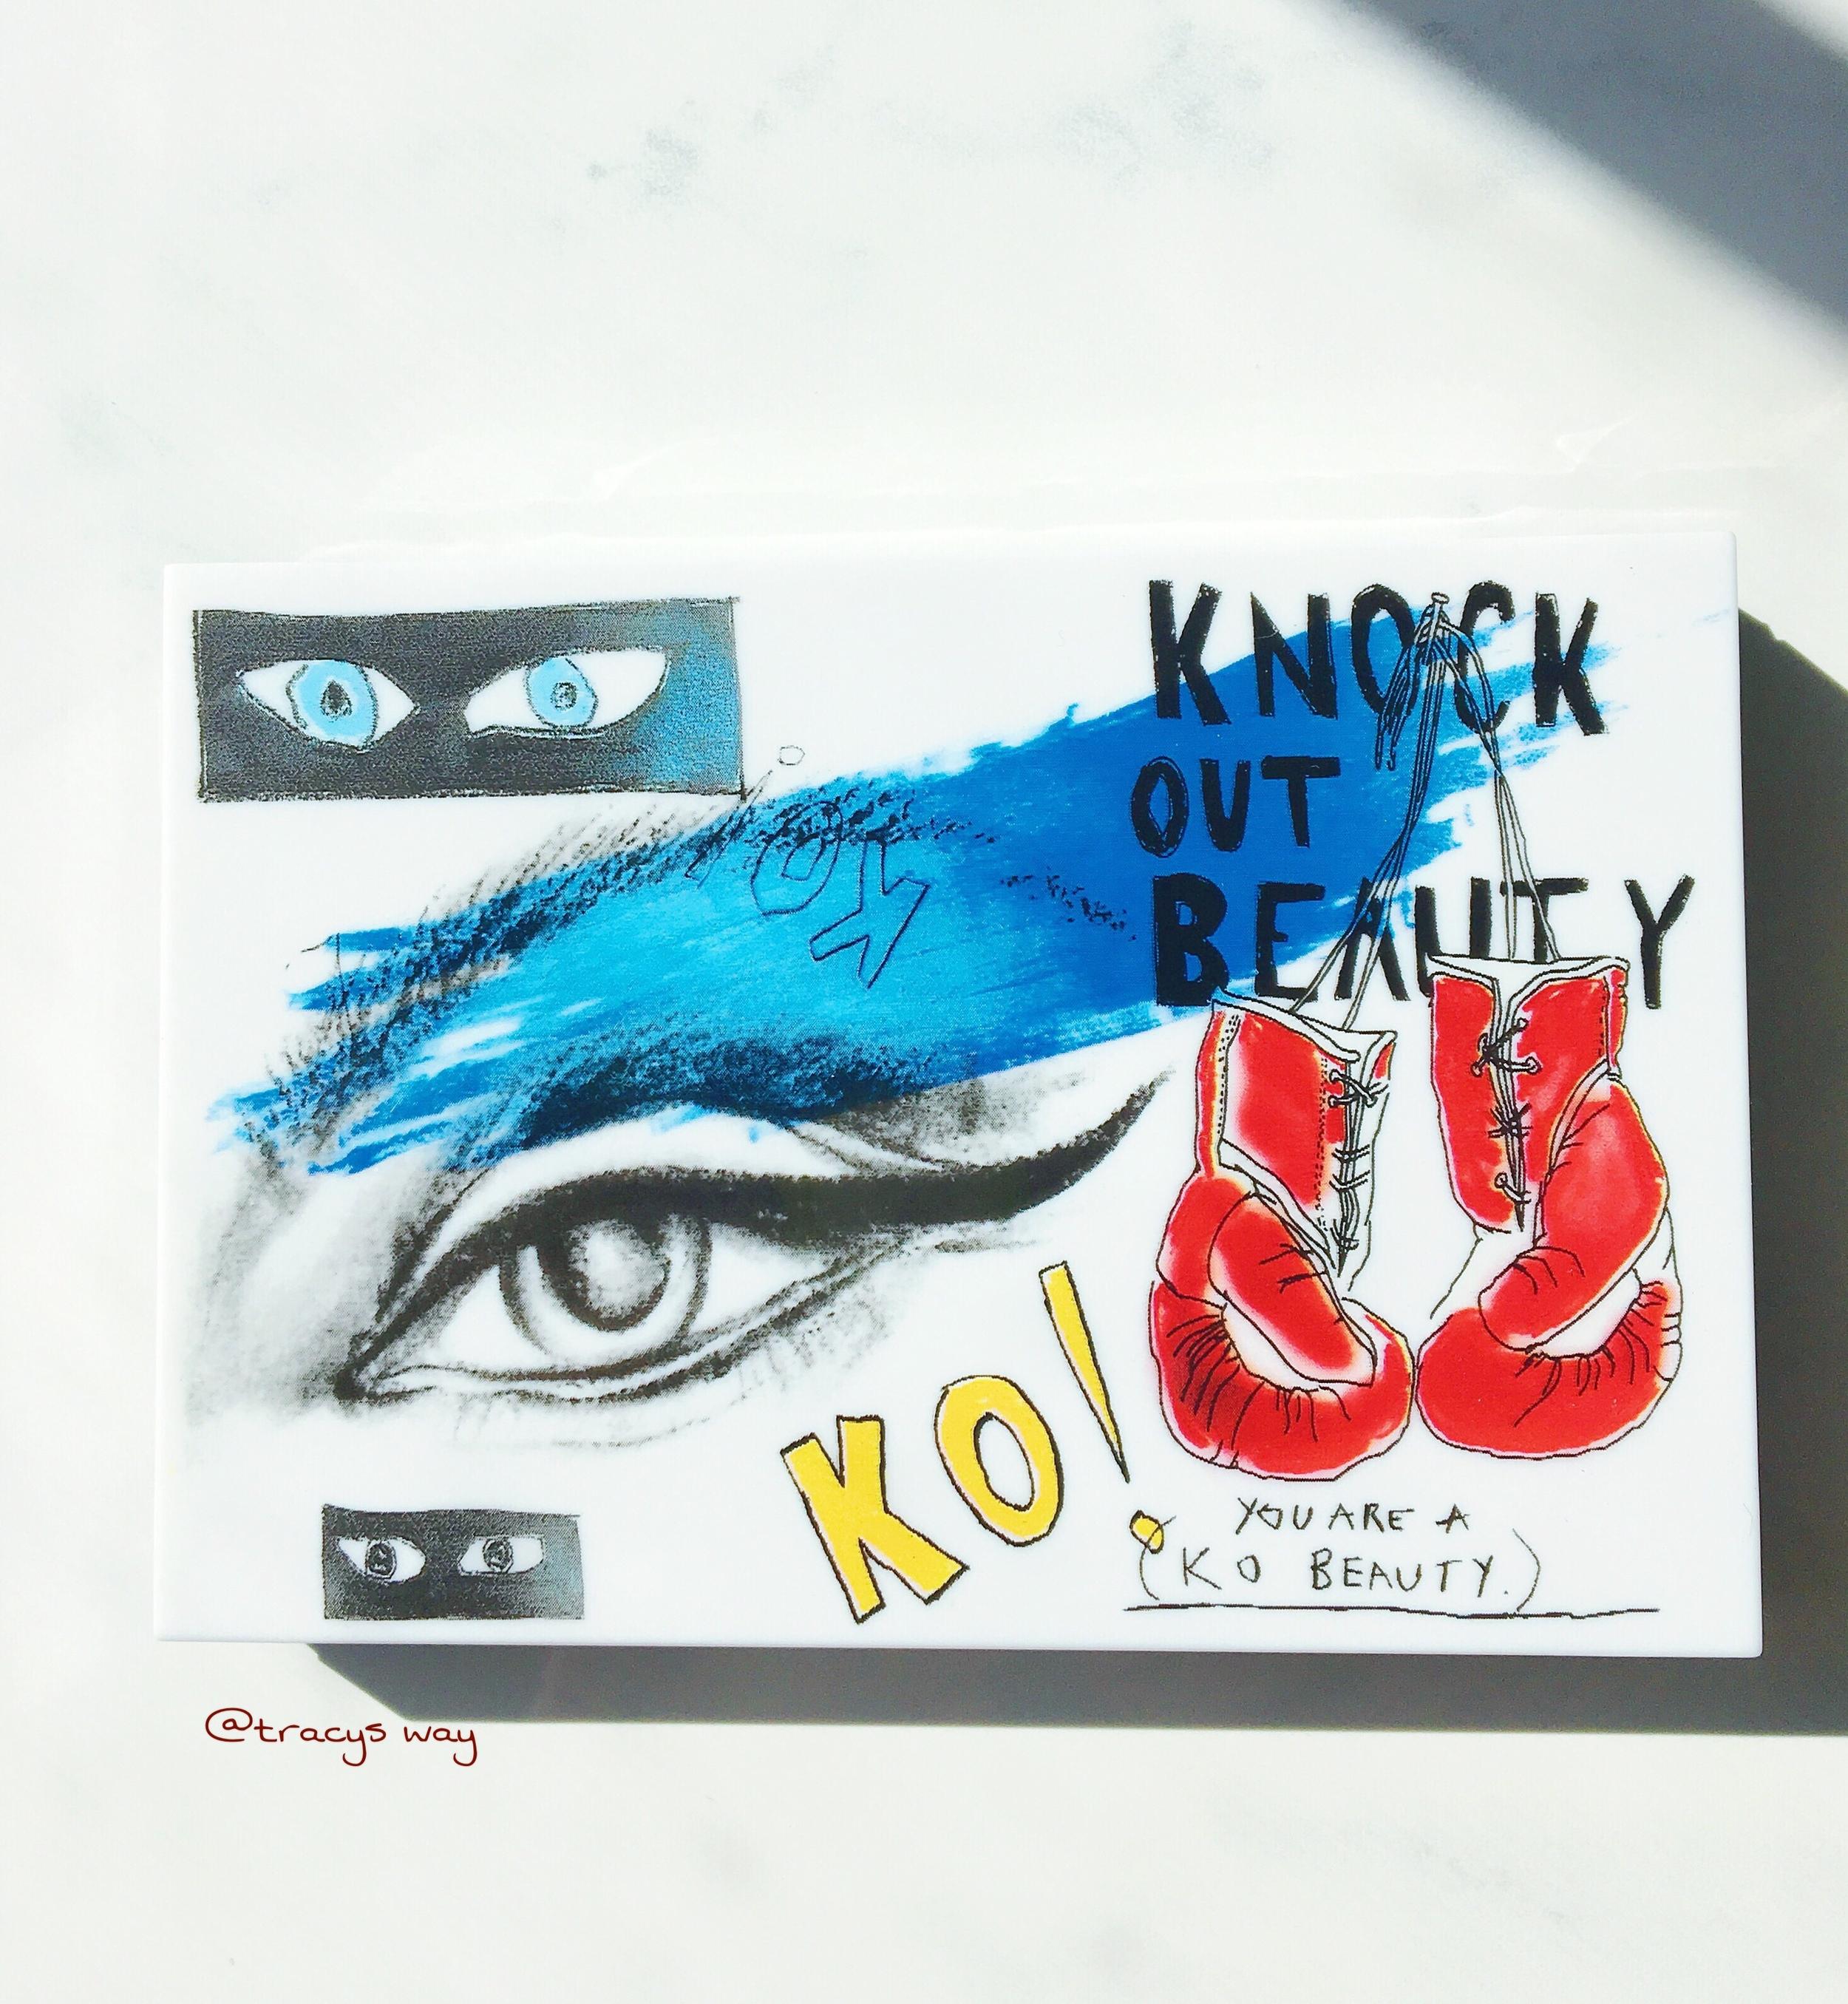 Sonia Kashuk Knock Out Beauty Shadow Box